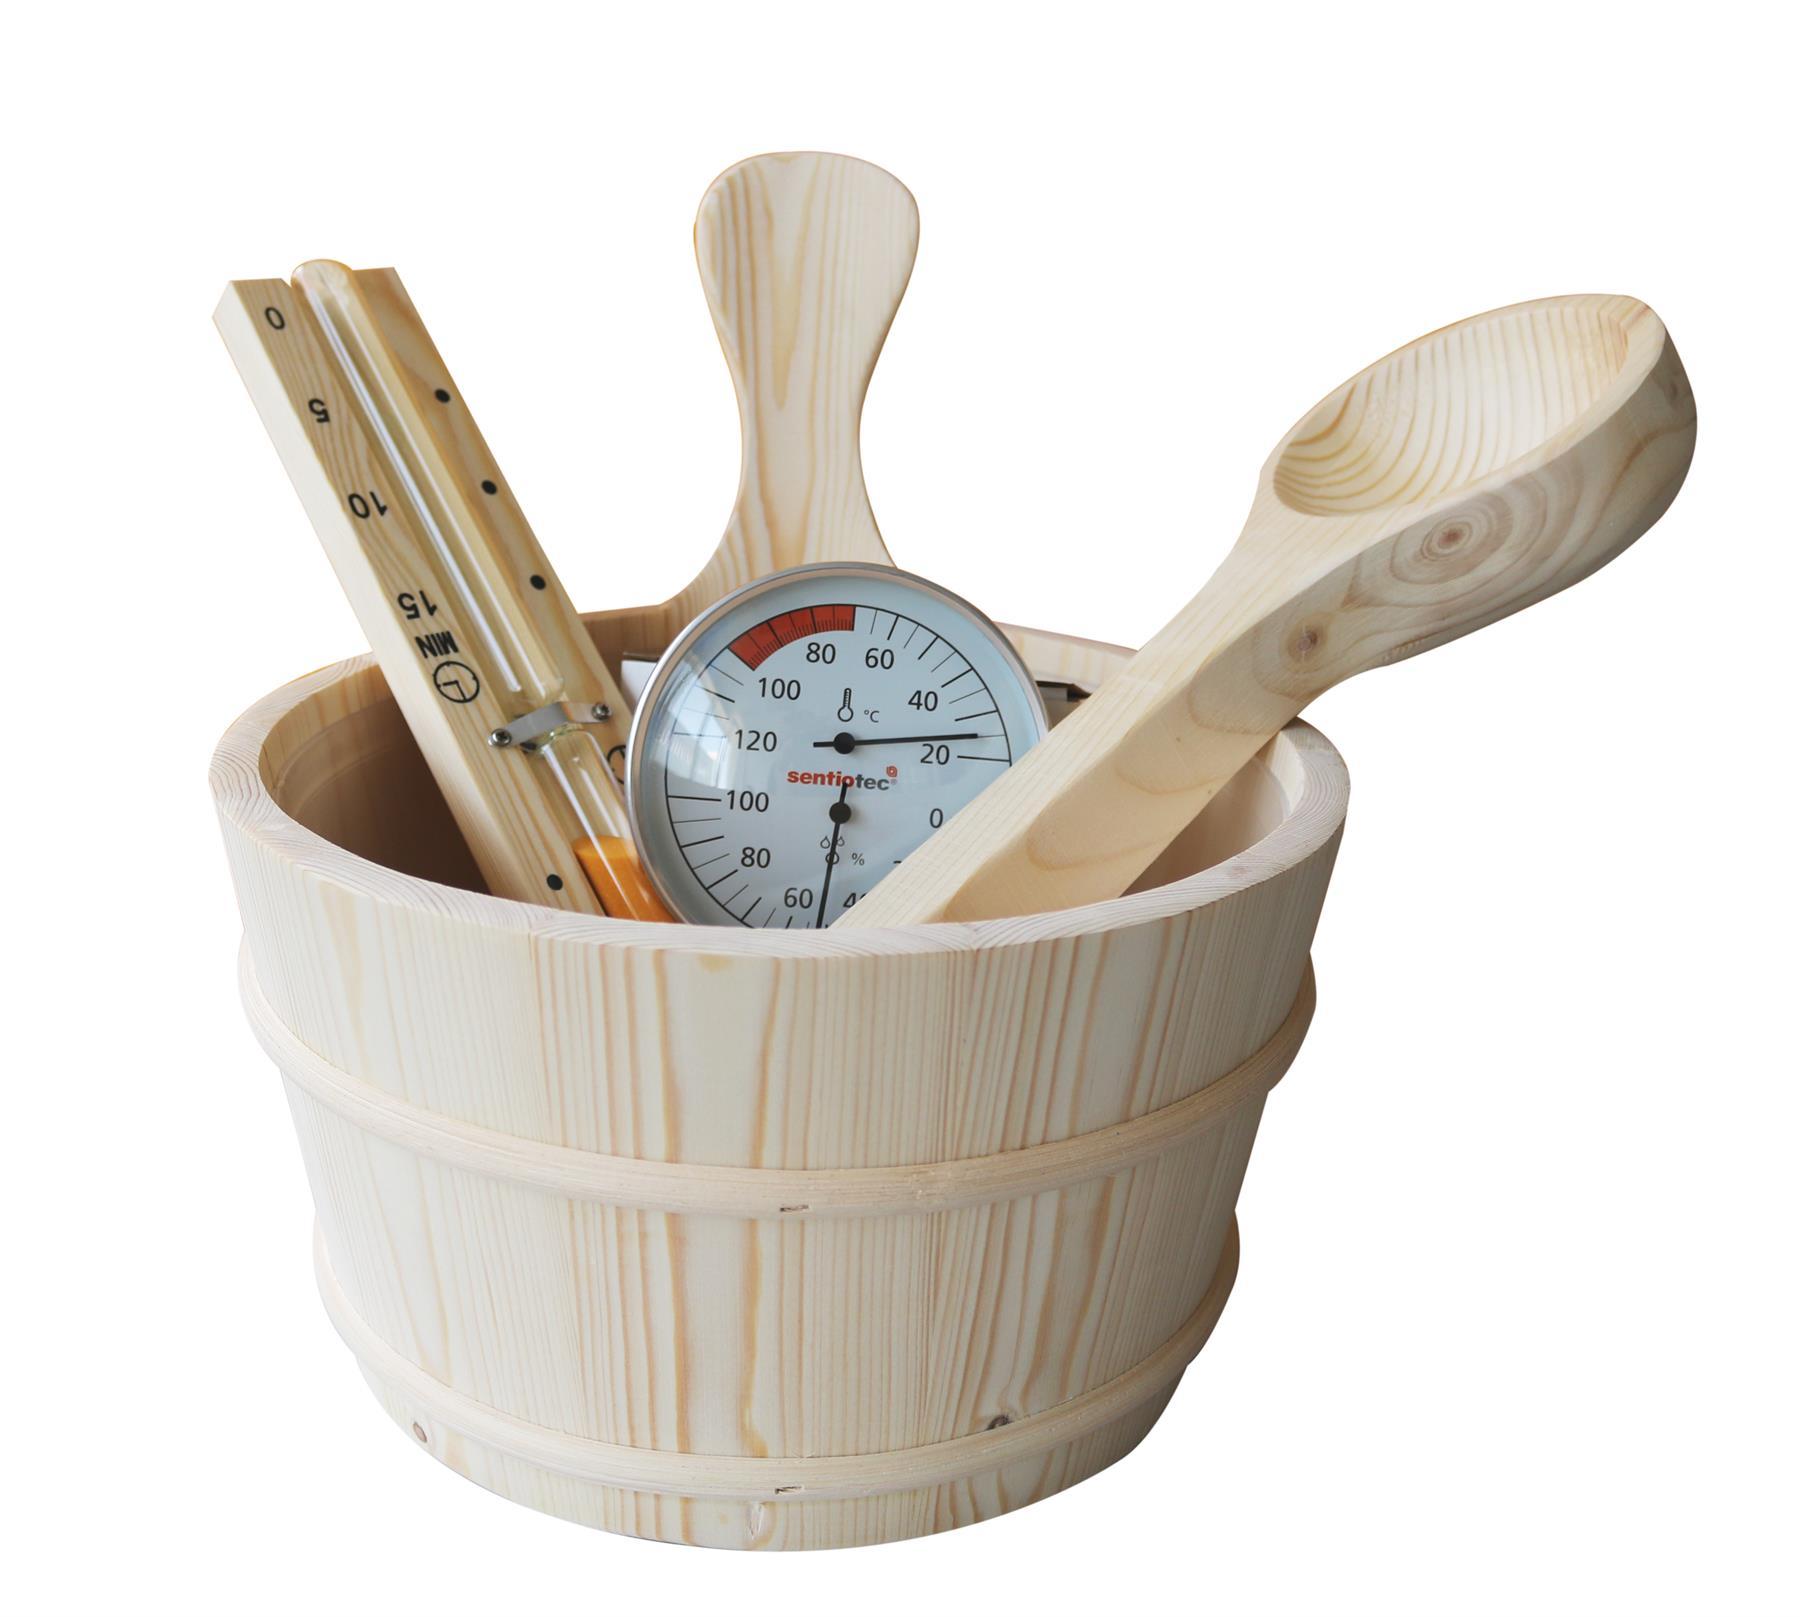 Tilbehørpakke med bøtte, sleiv, termometer og timeglass